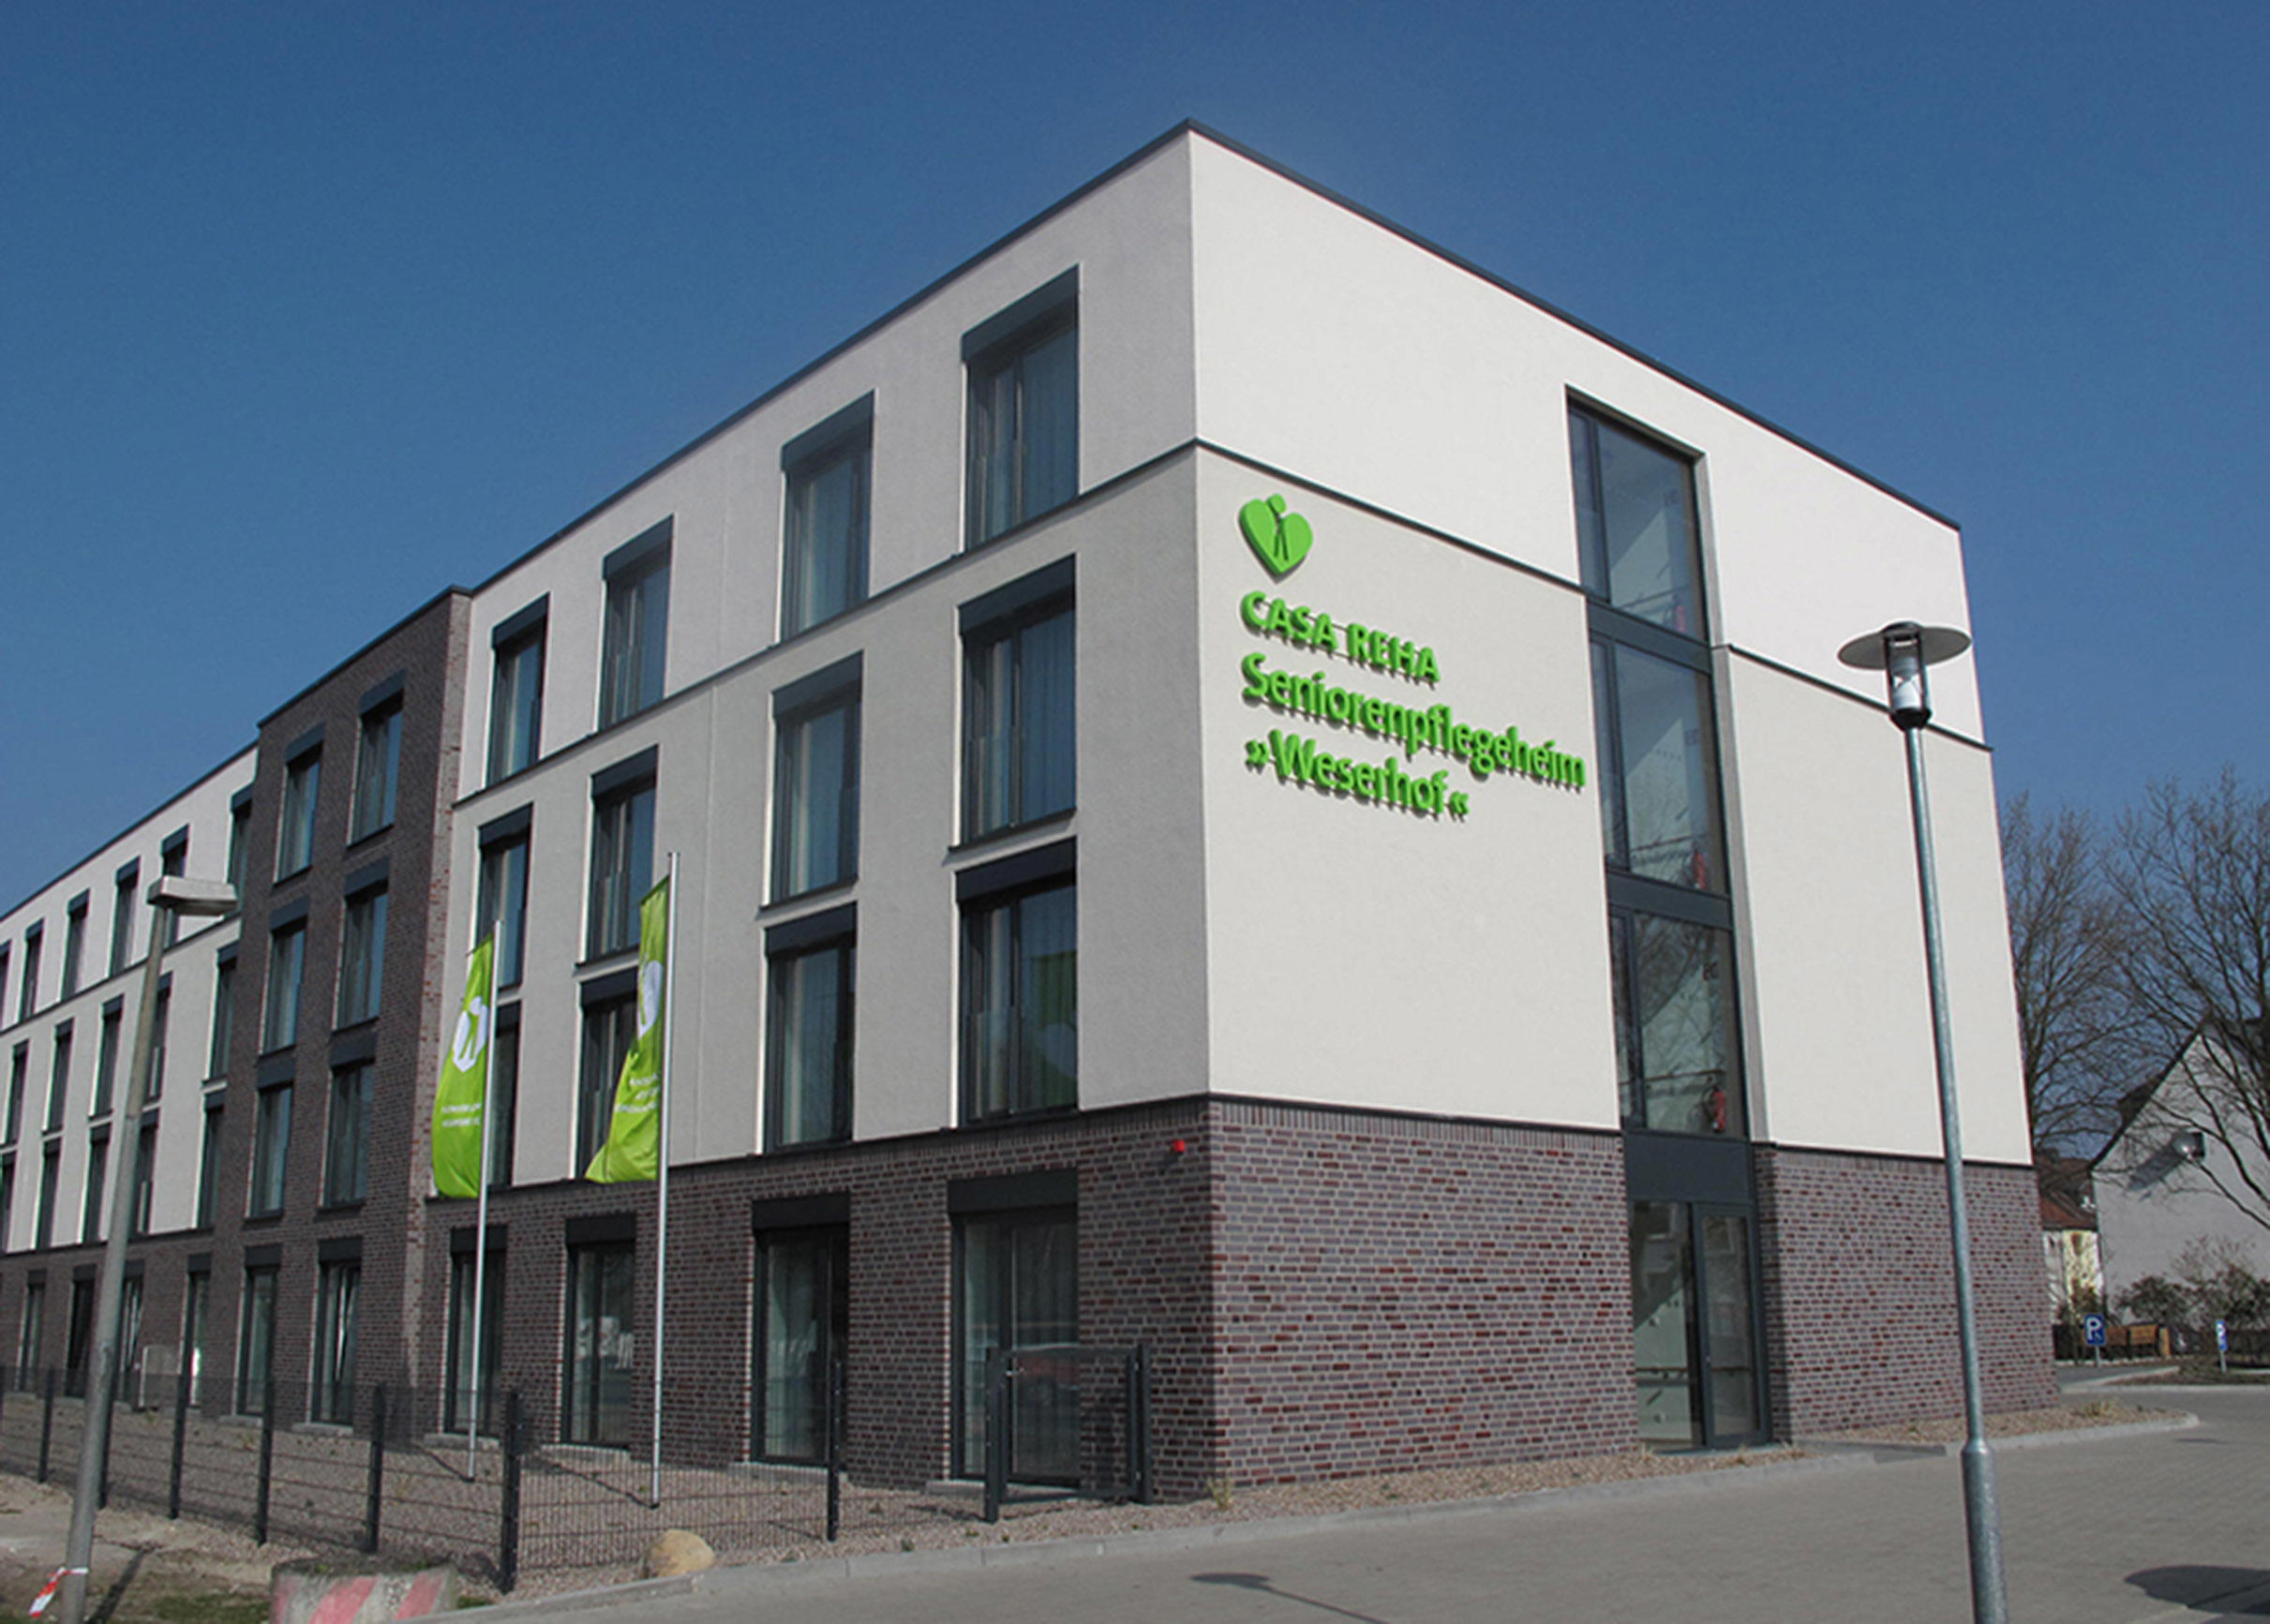 Haus Weserhof Bremen